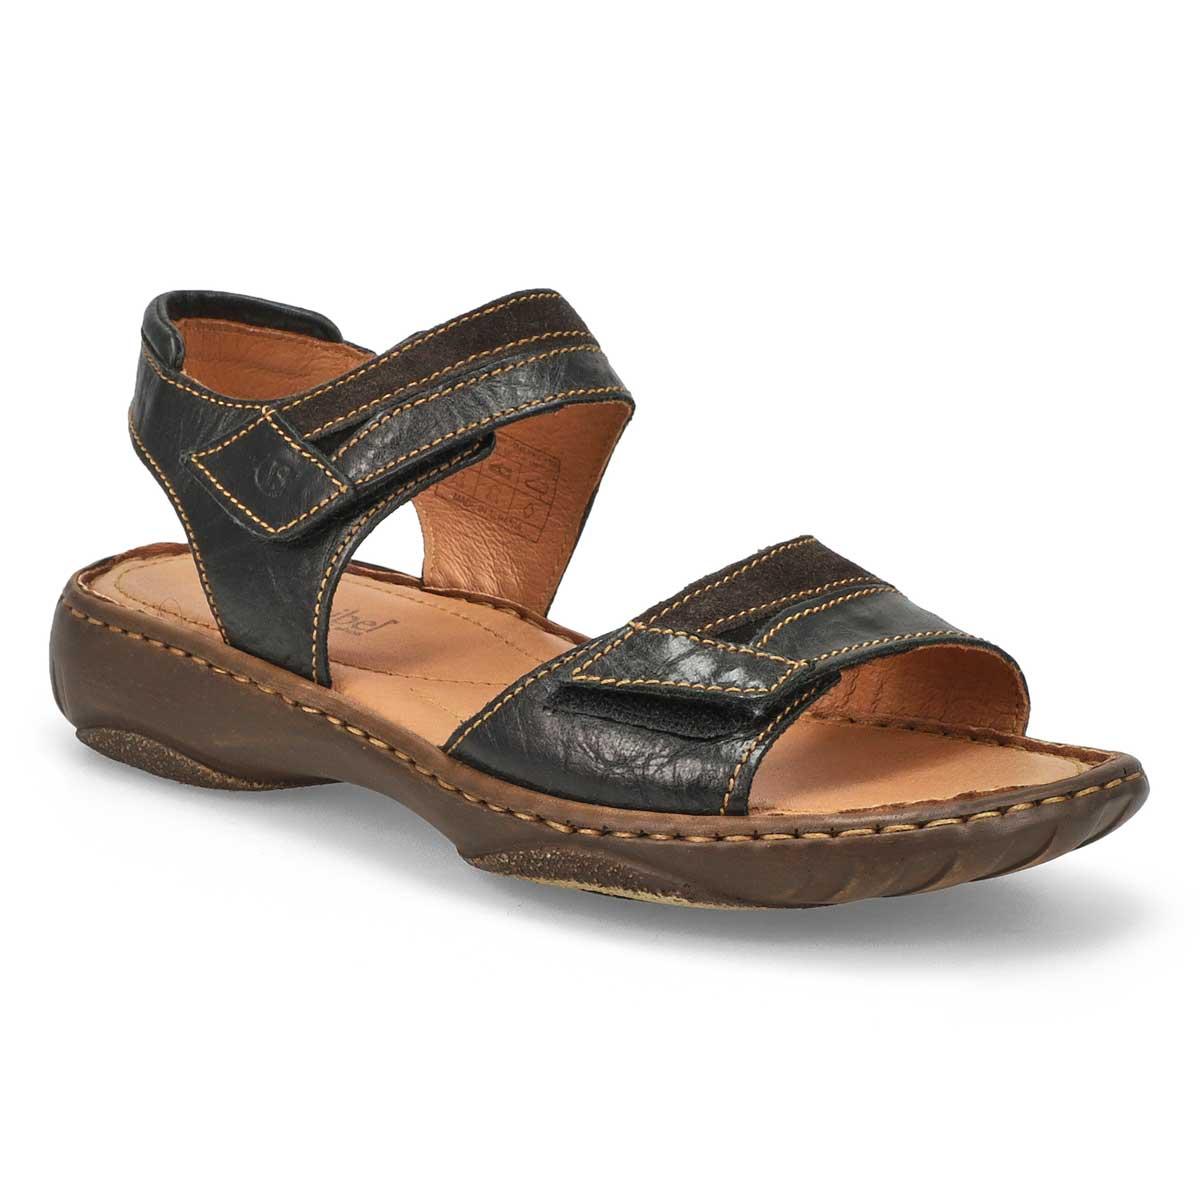 Women's DEBRA 19 black casual 2 strap sandals